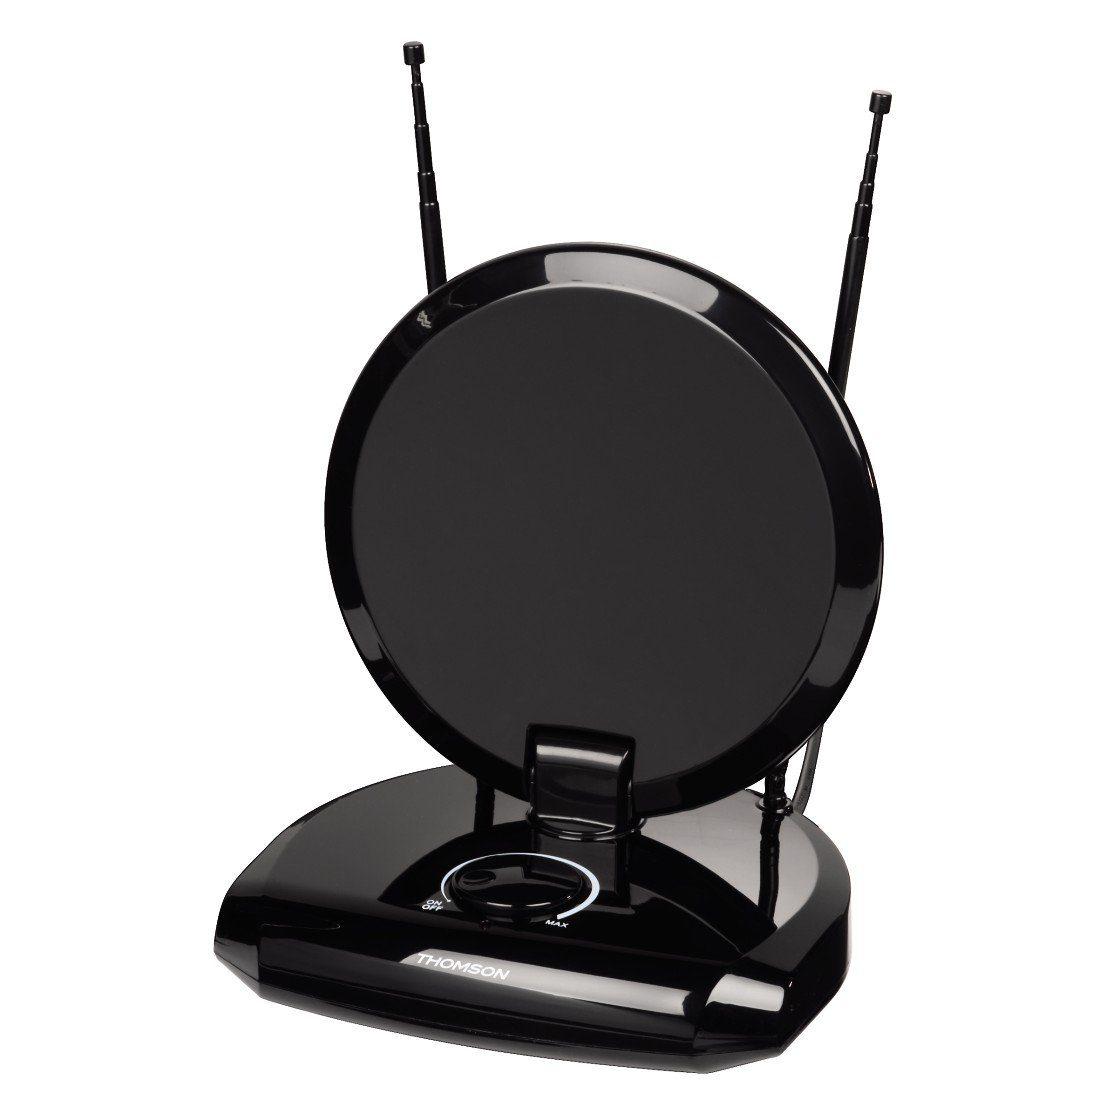 Thomson ANT1731 DVB-T/DVB-T2 Zimmerantenne, 40 dB